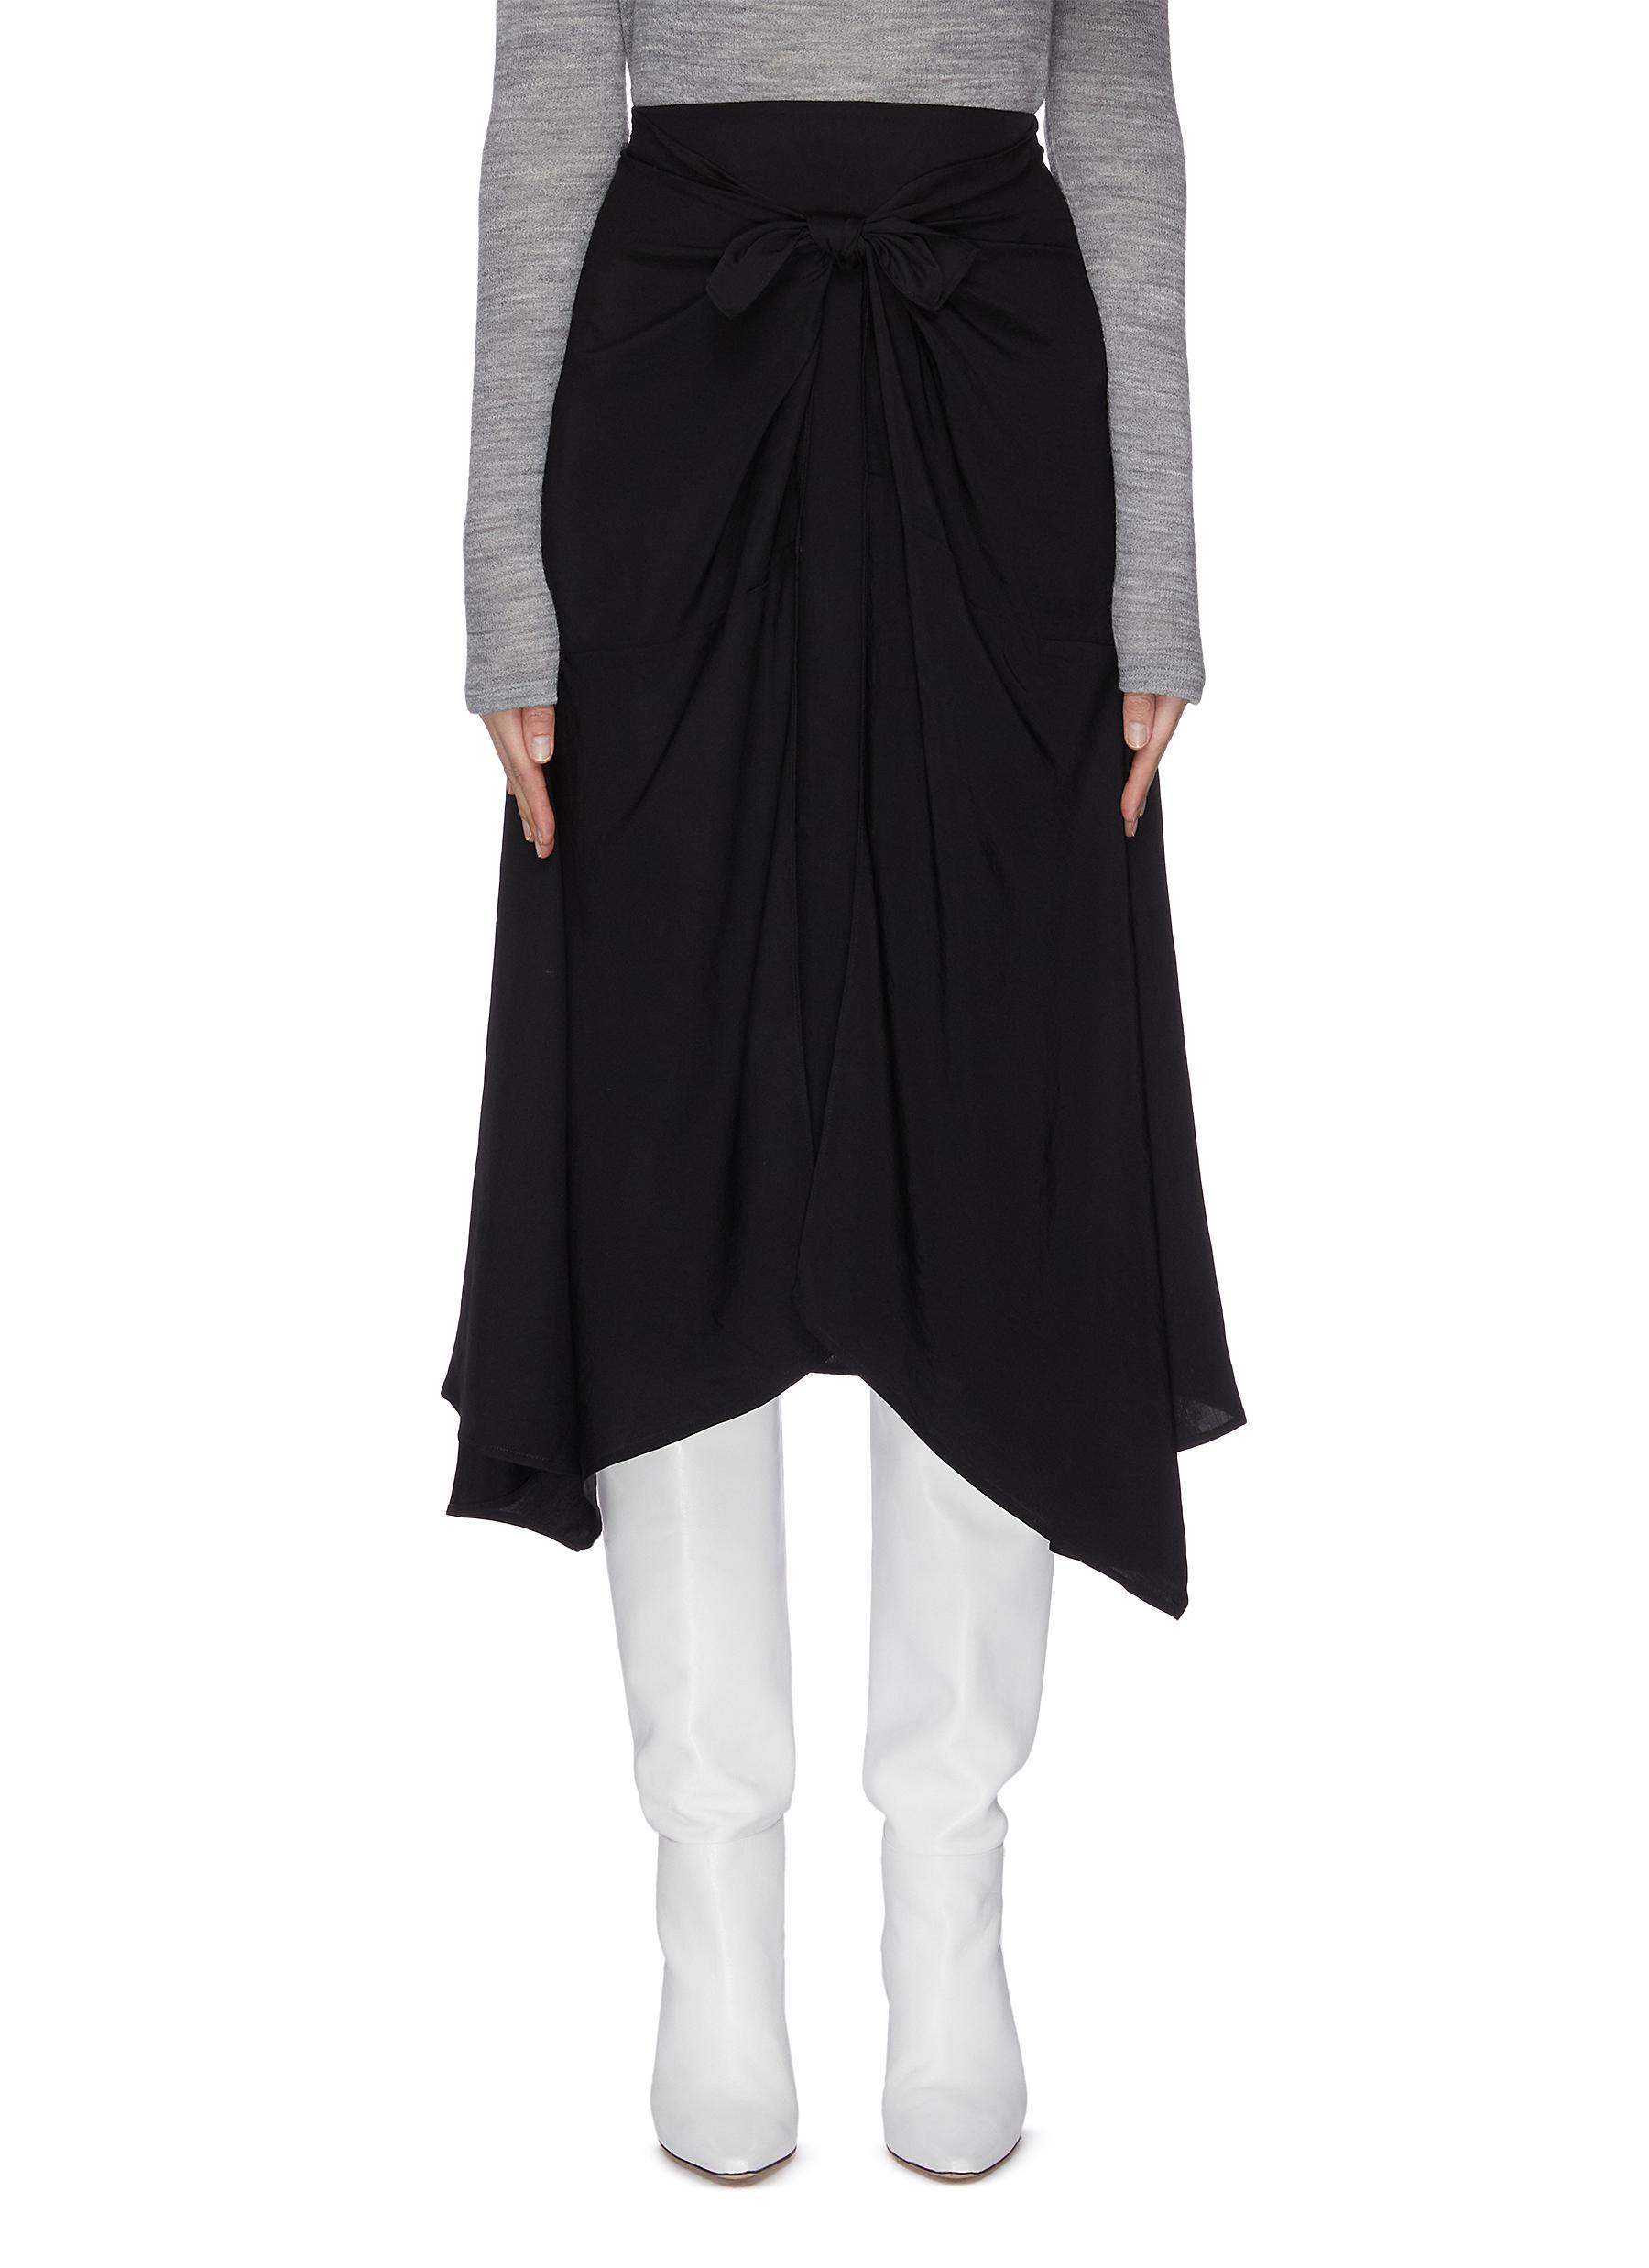 Buy Vince Skirts Tie front asymmetrical skirt